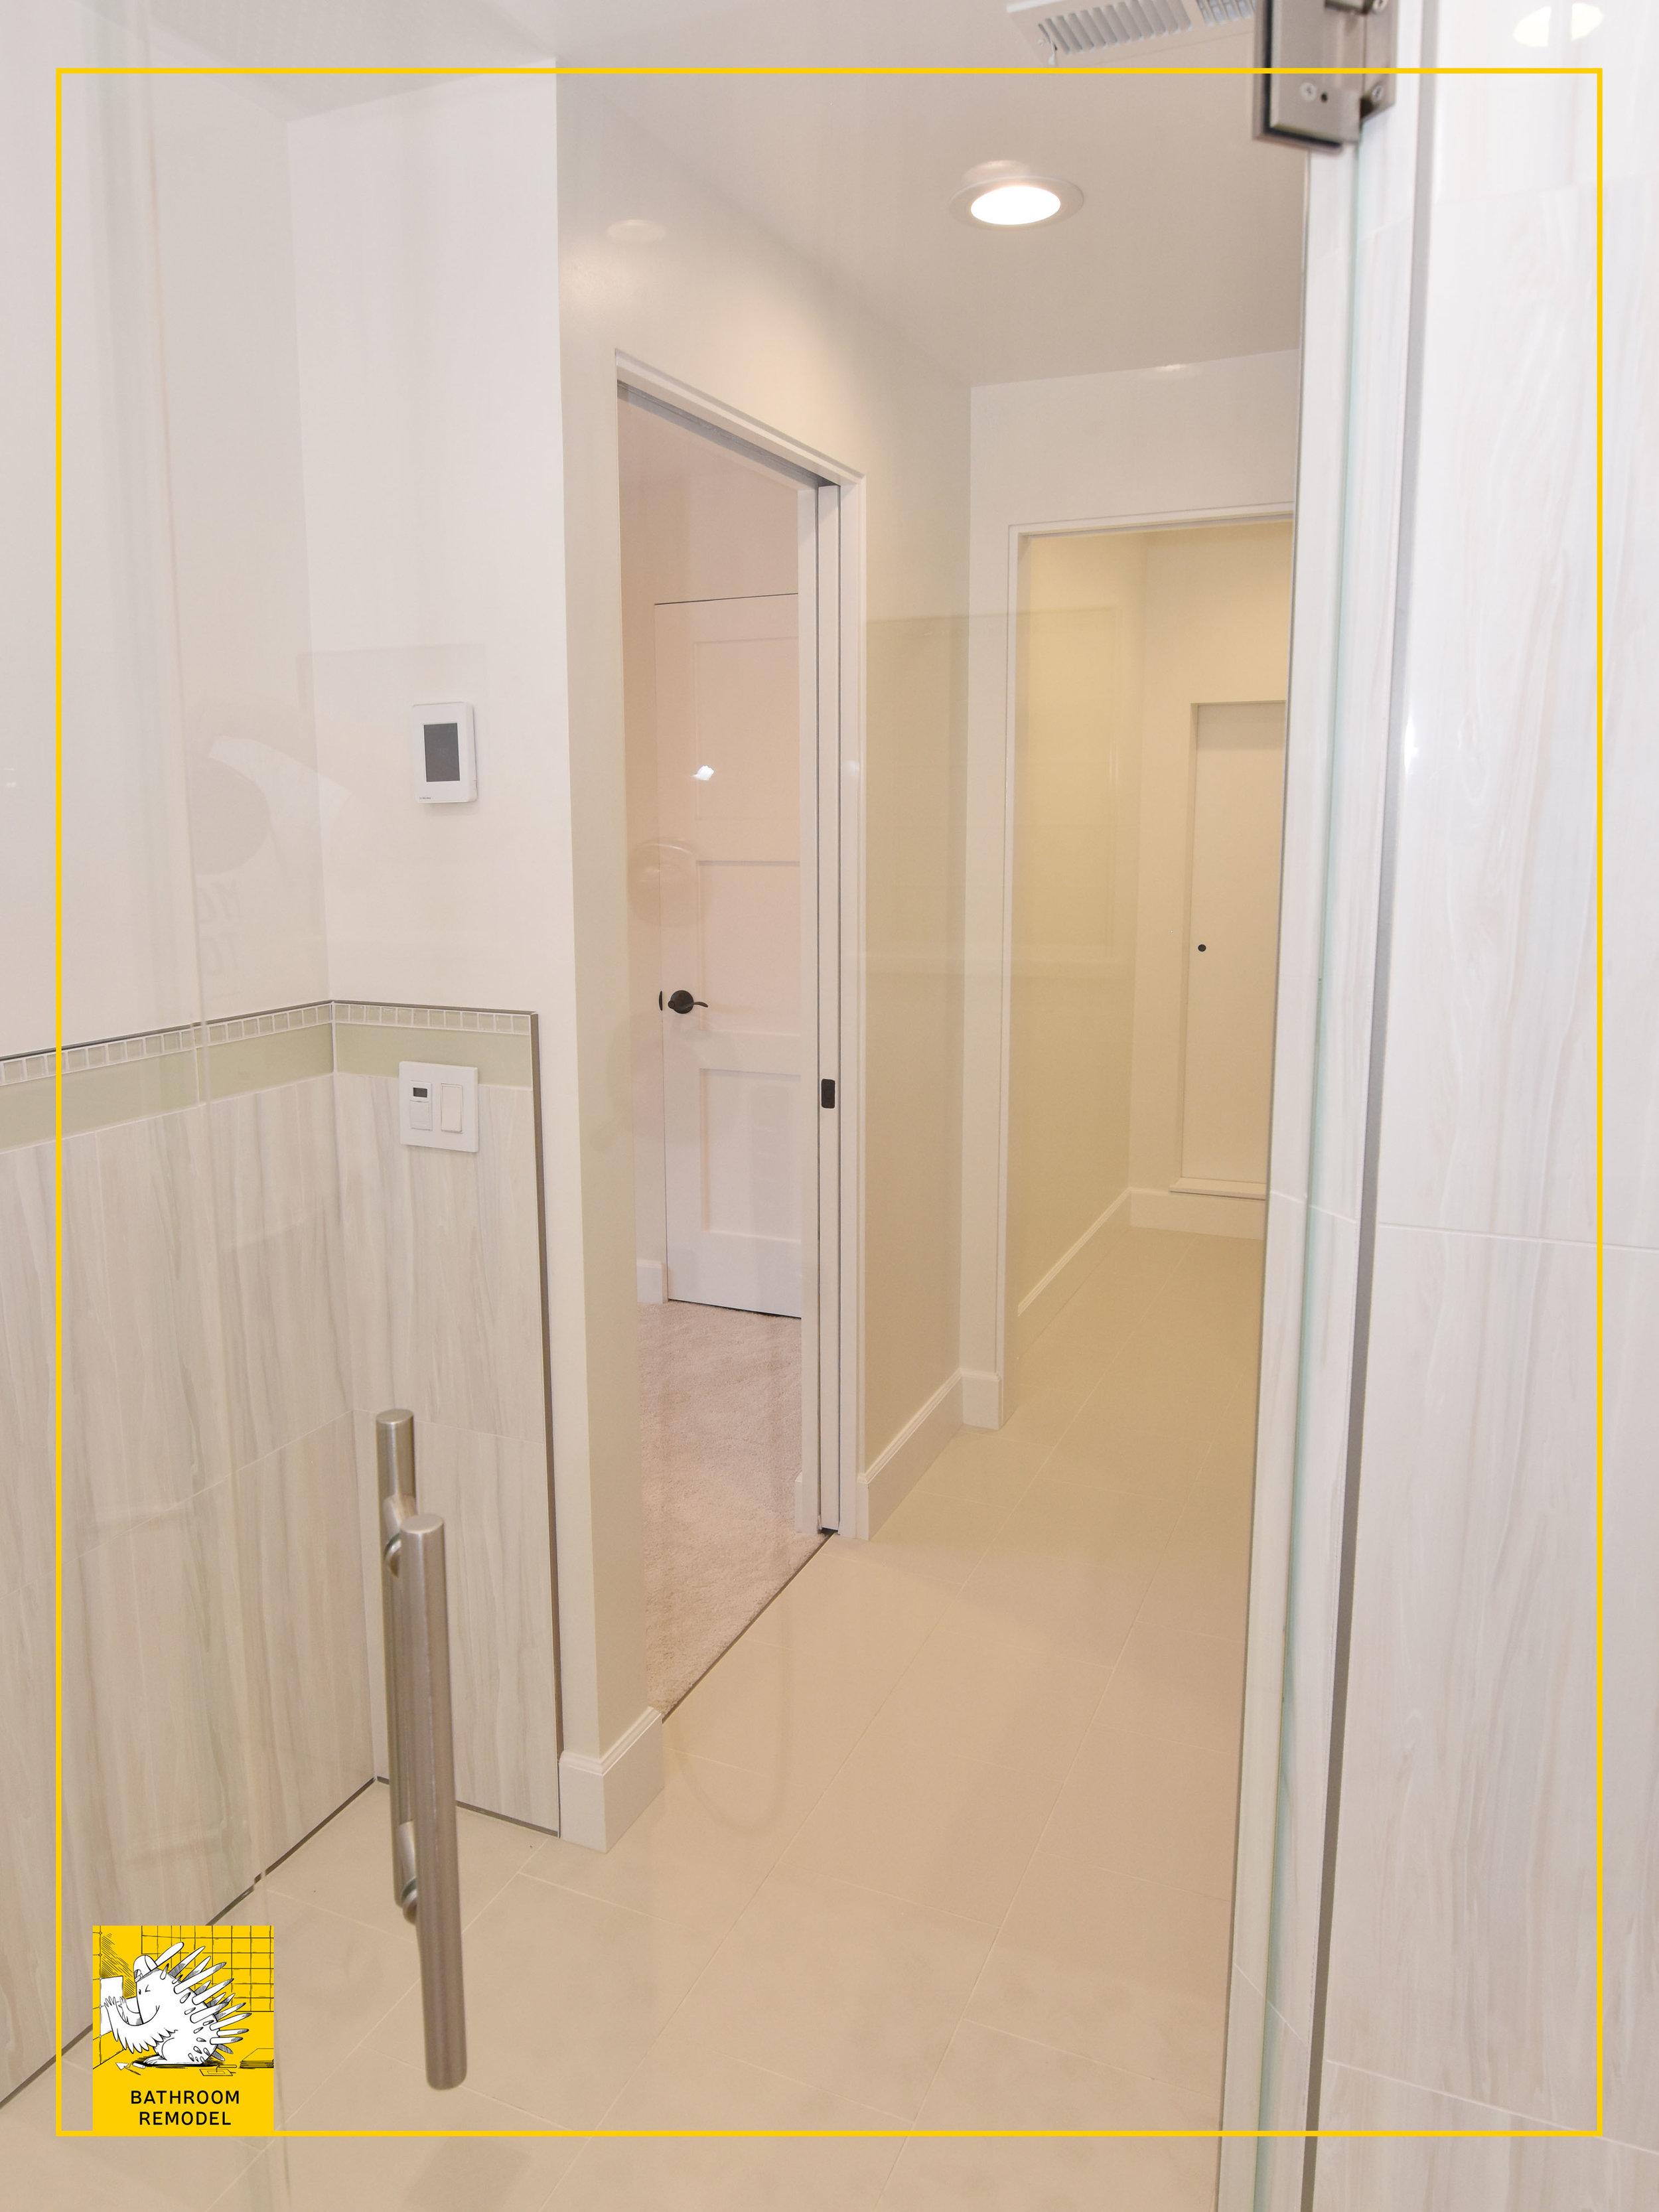 MT bathroom 6 after 5.jpg